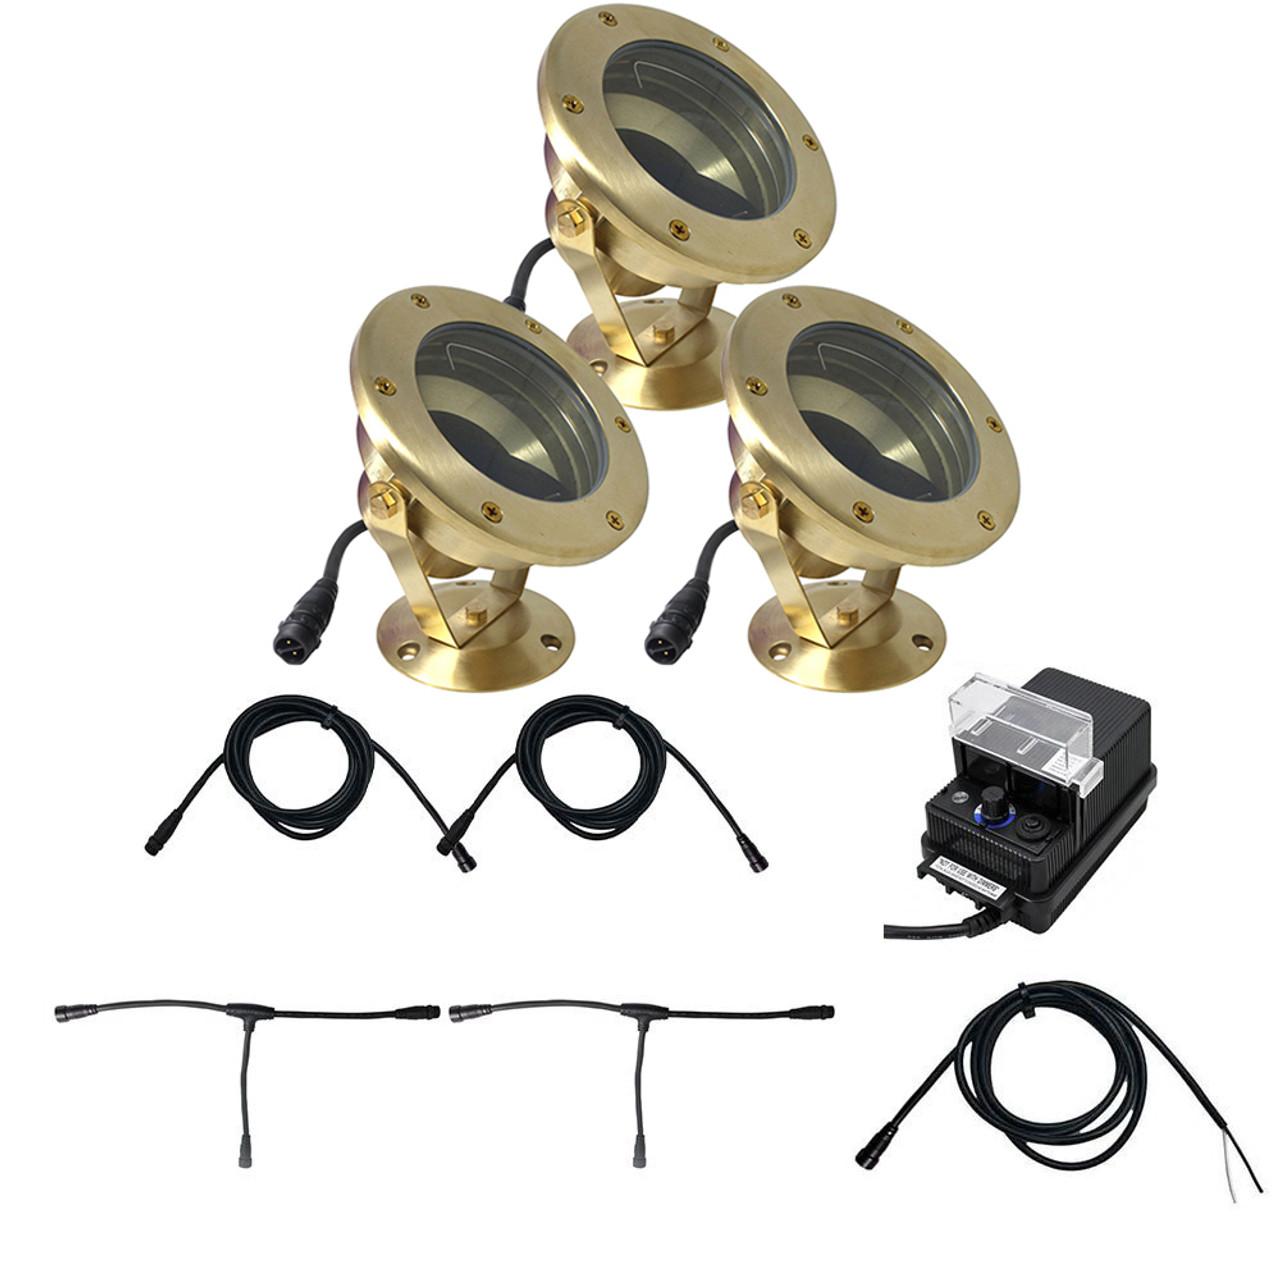 N.S.C.  Wiring System Kits